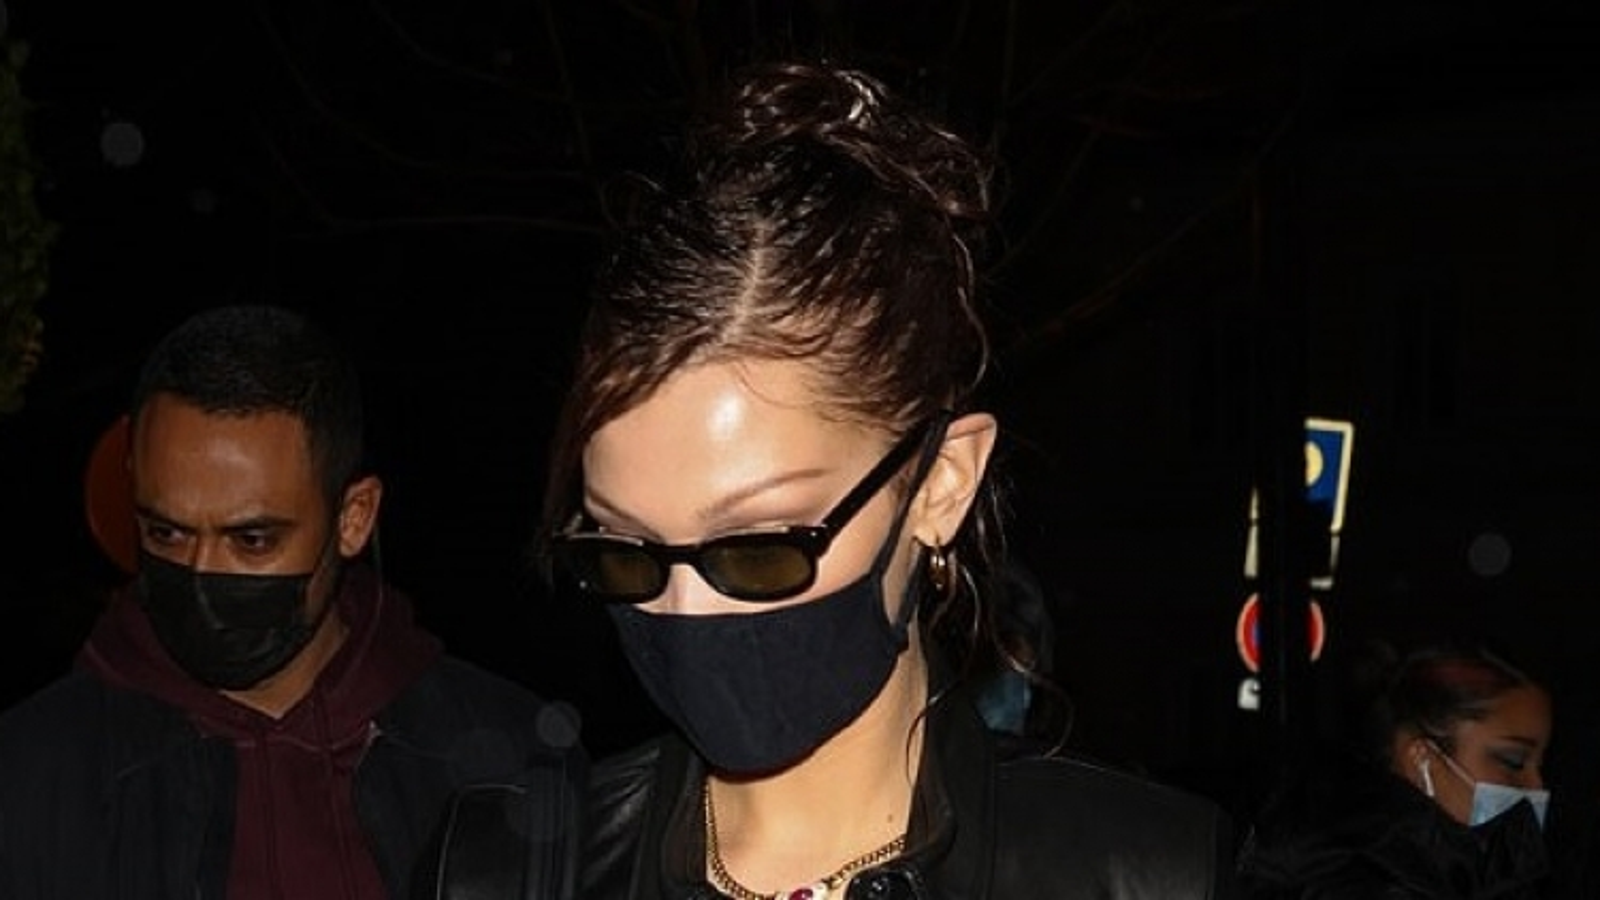 Bella Hadid giản dị rời khỏi Tuần lễ thời trang Haute Couture lúc tối muộn